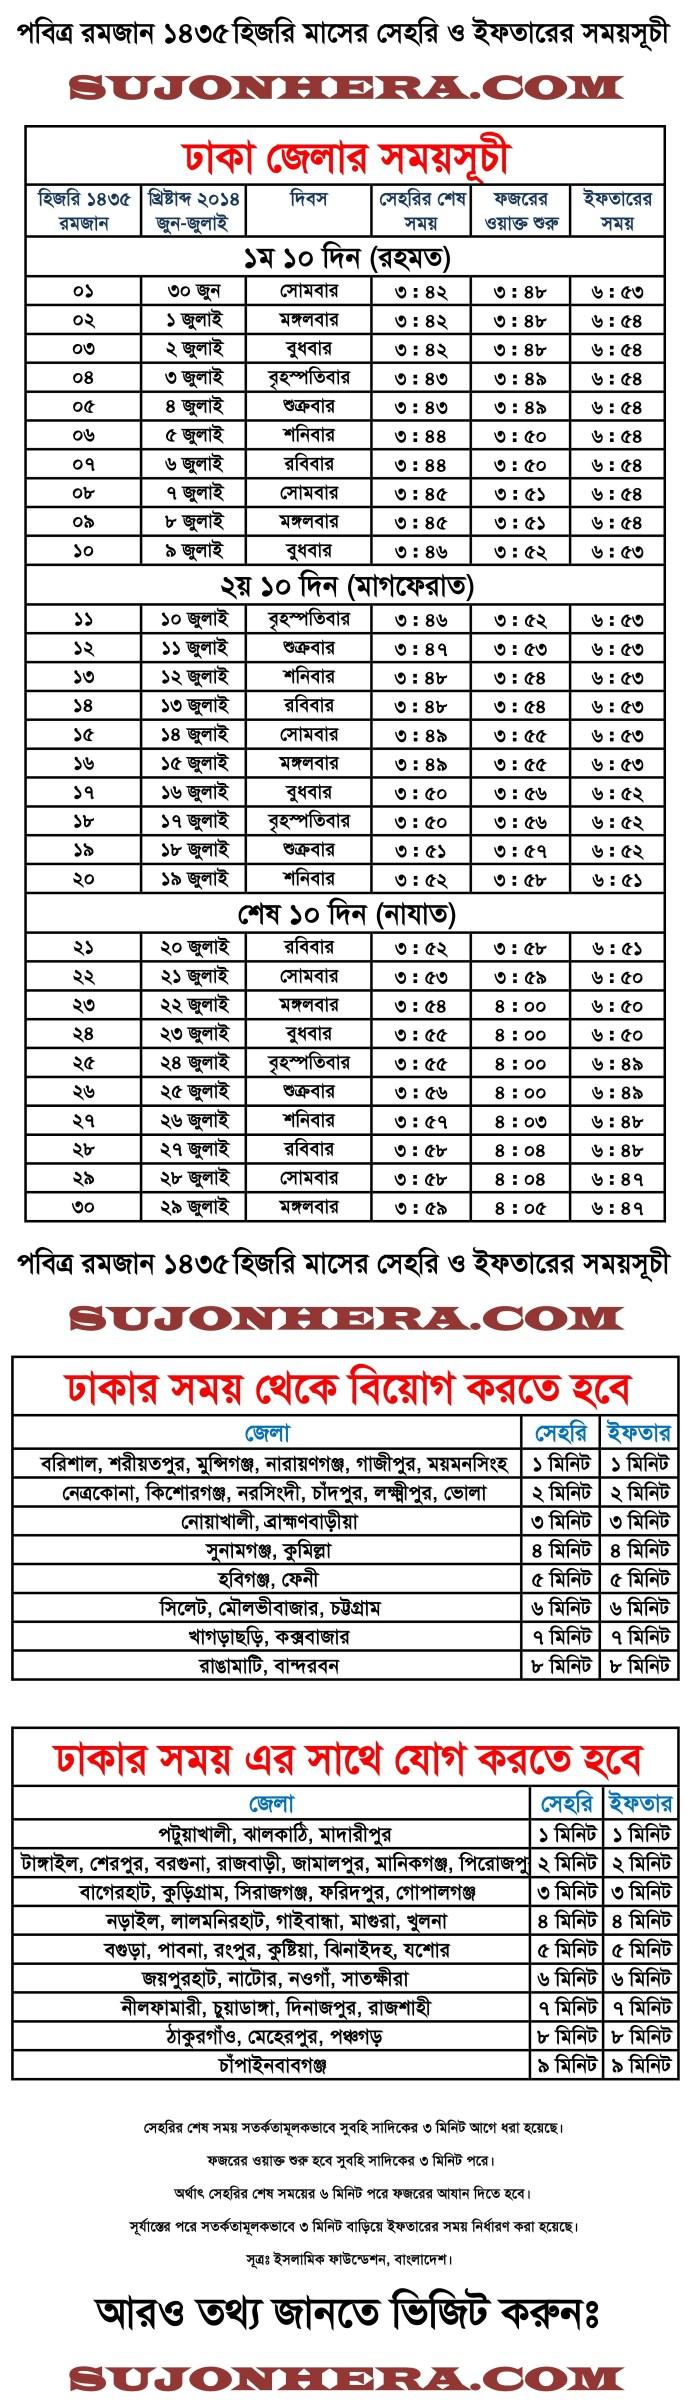 Ramadan Calendar 2014 Bangladesh Download Sehri Iftar Time